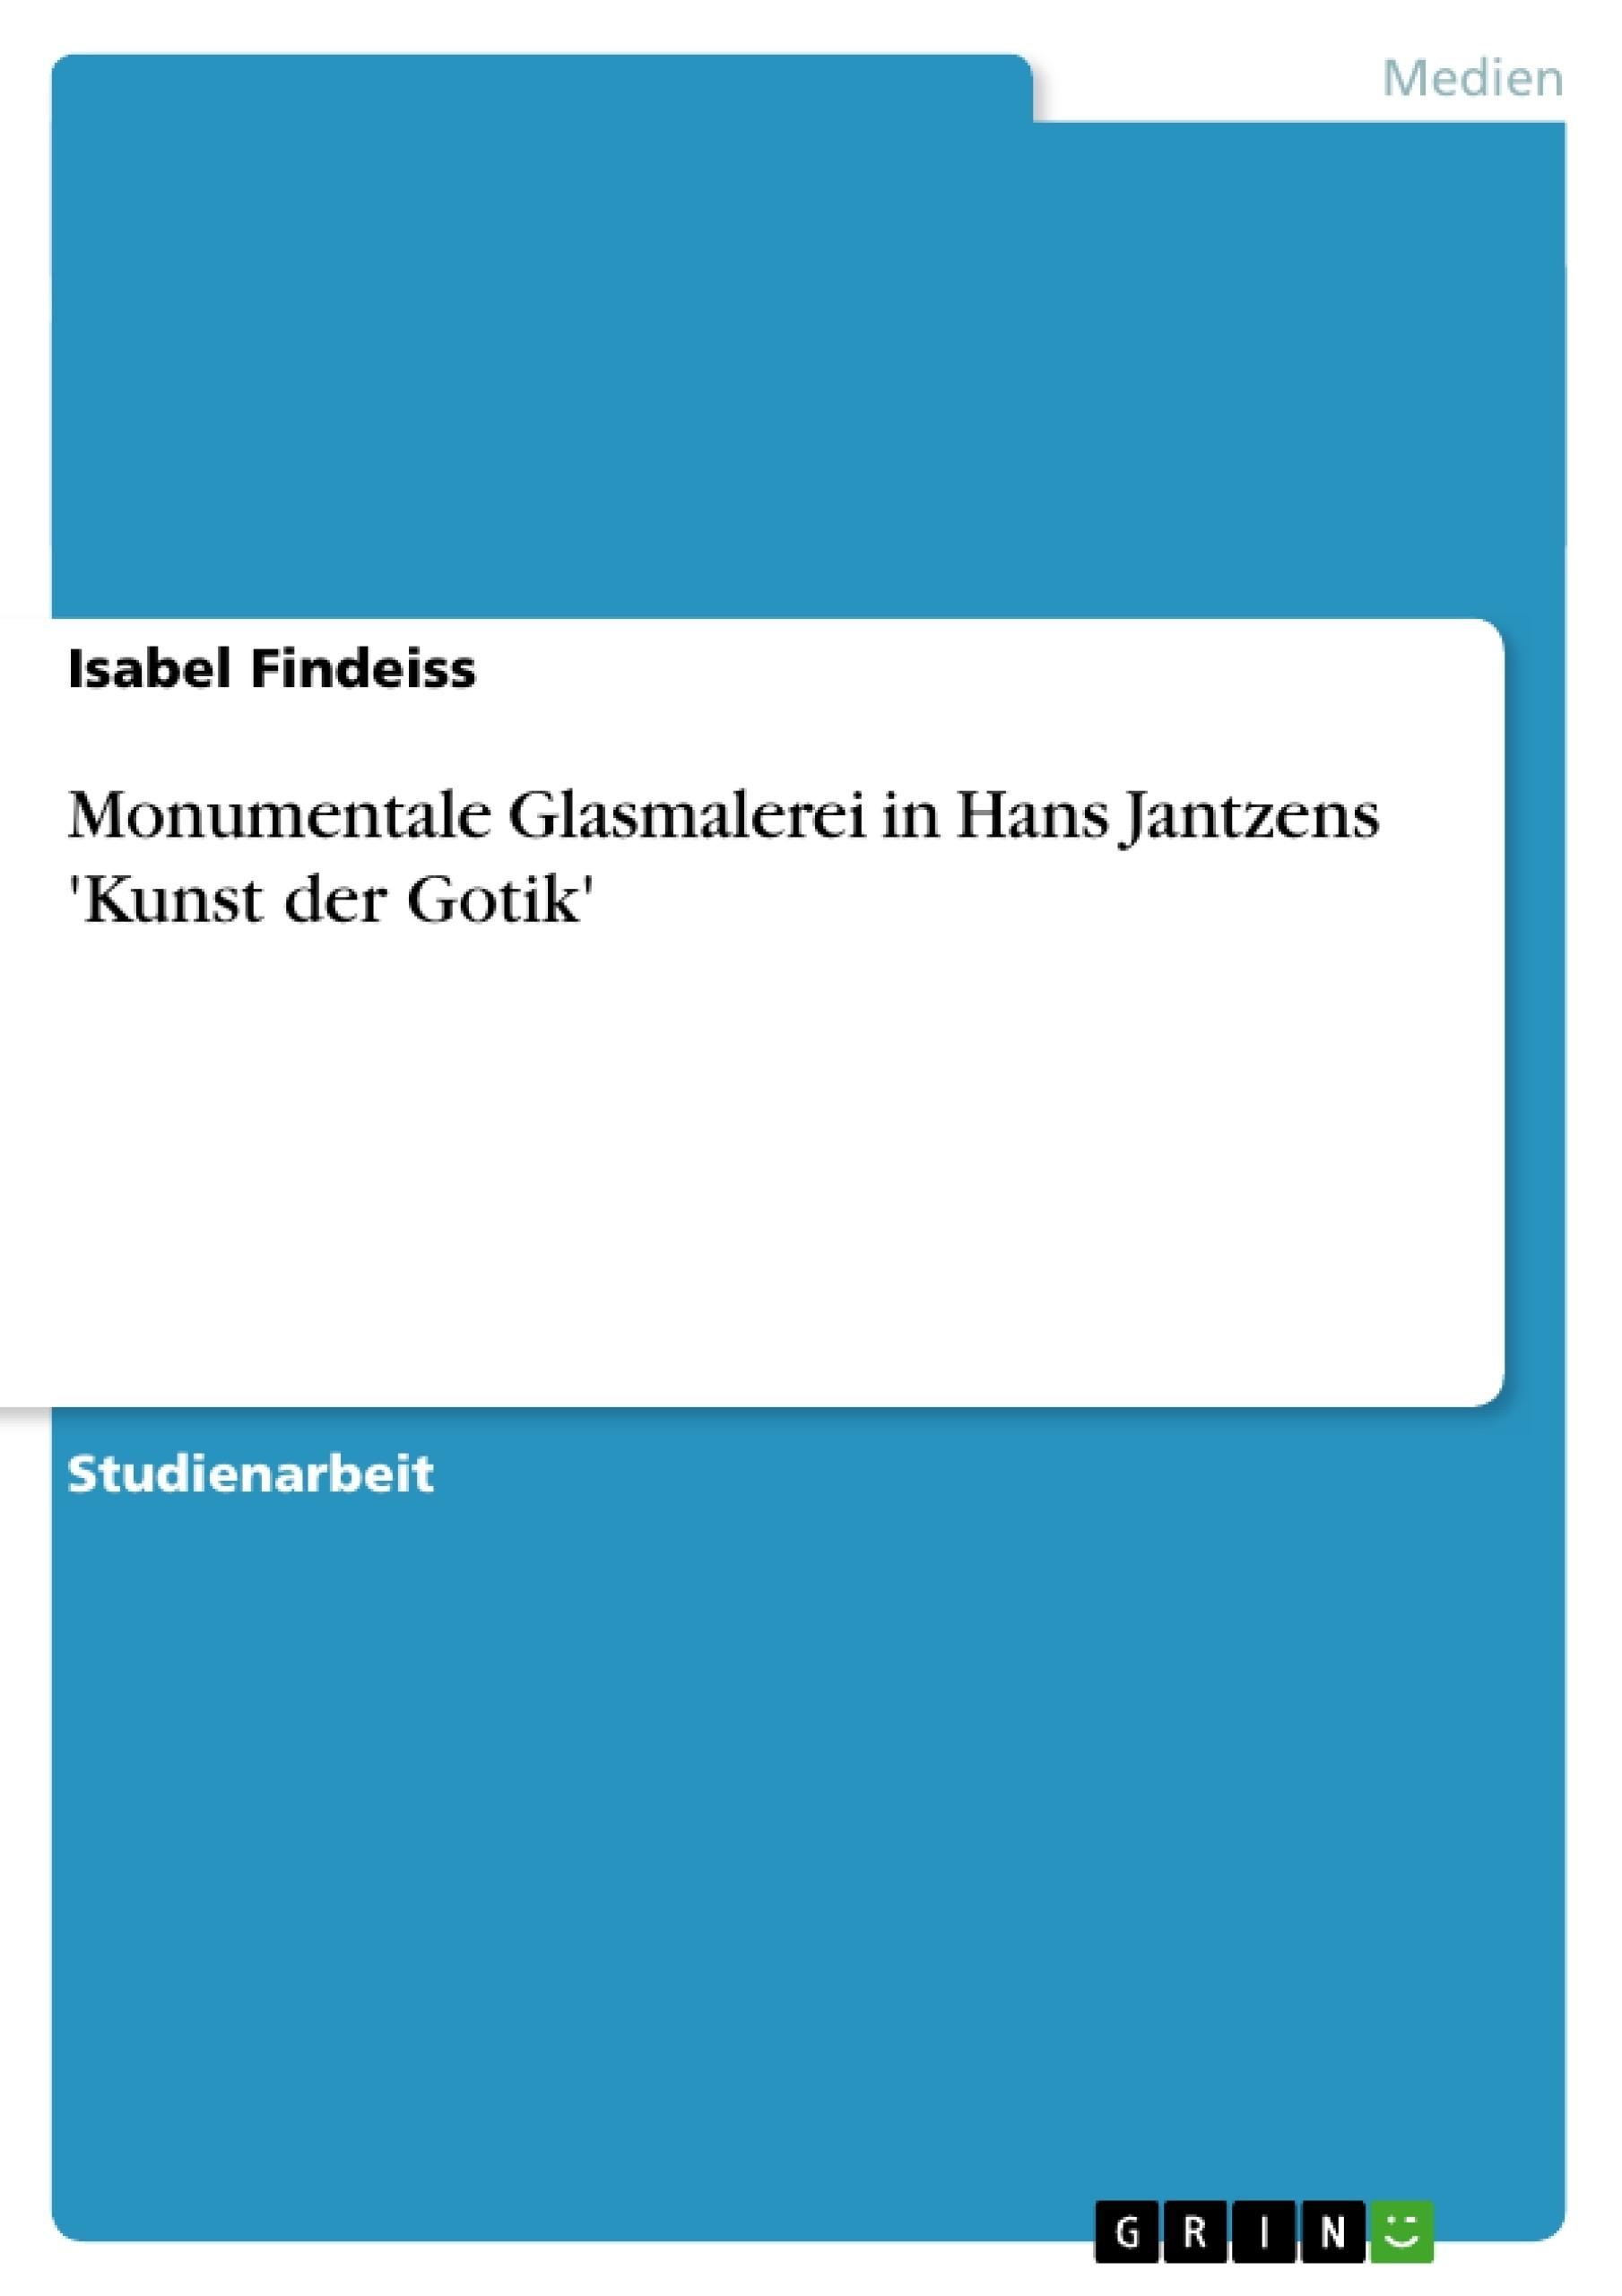 Titel: Monumentale Glasmalerei in Hans Jantzens 'Kunst der Gotik'